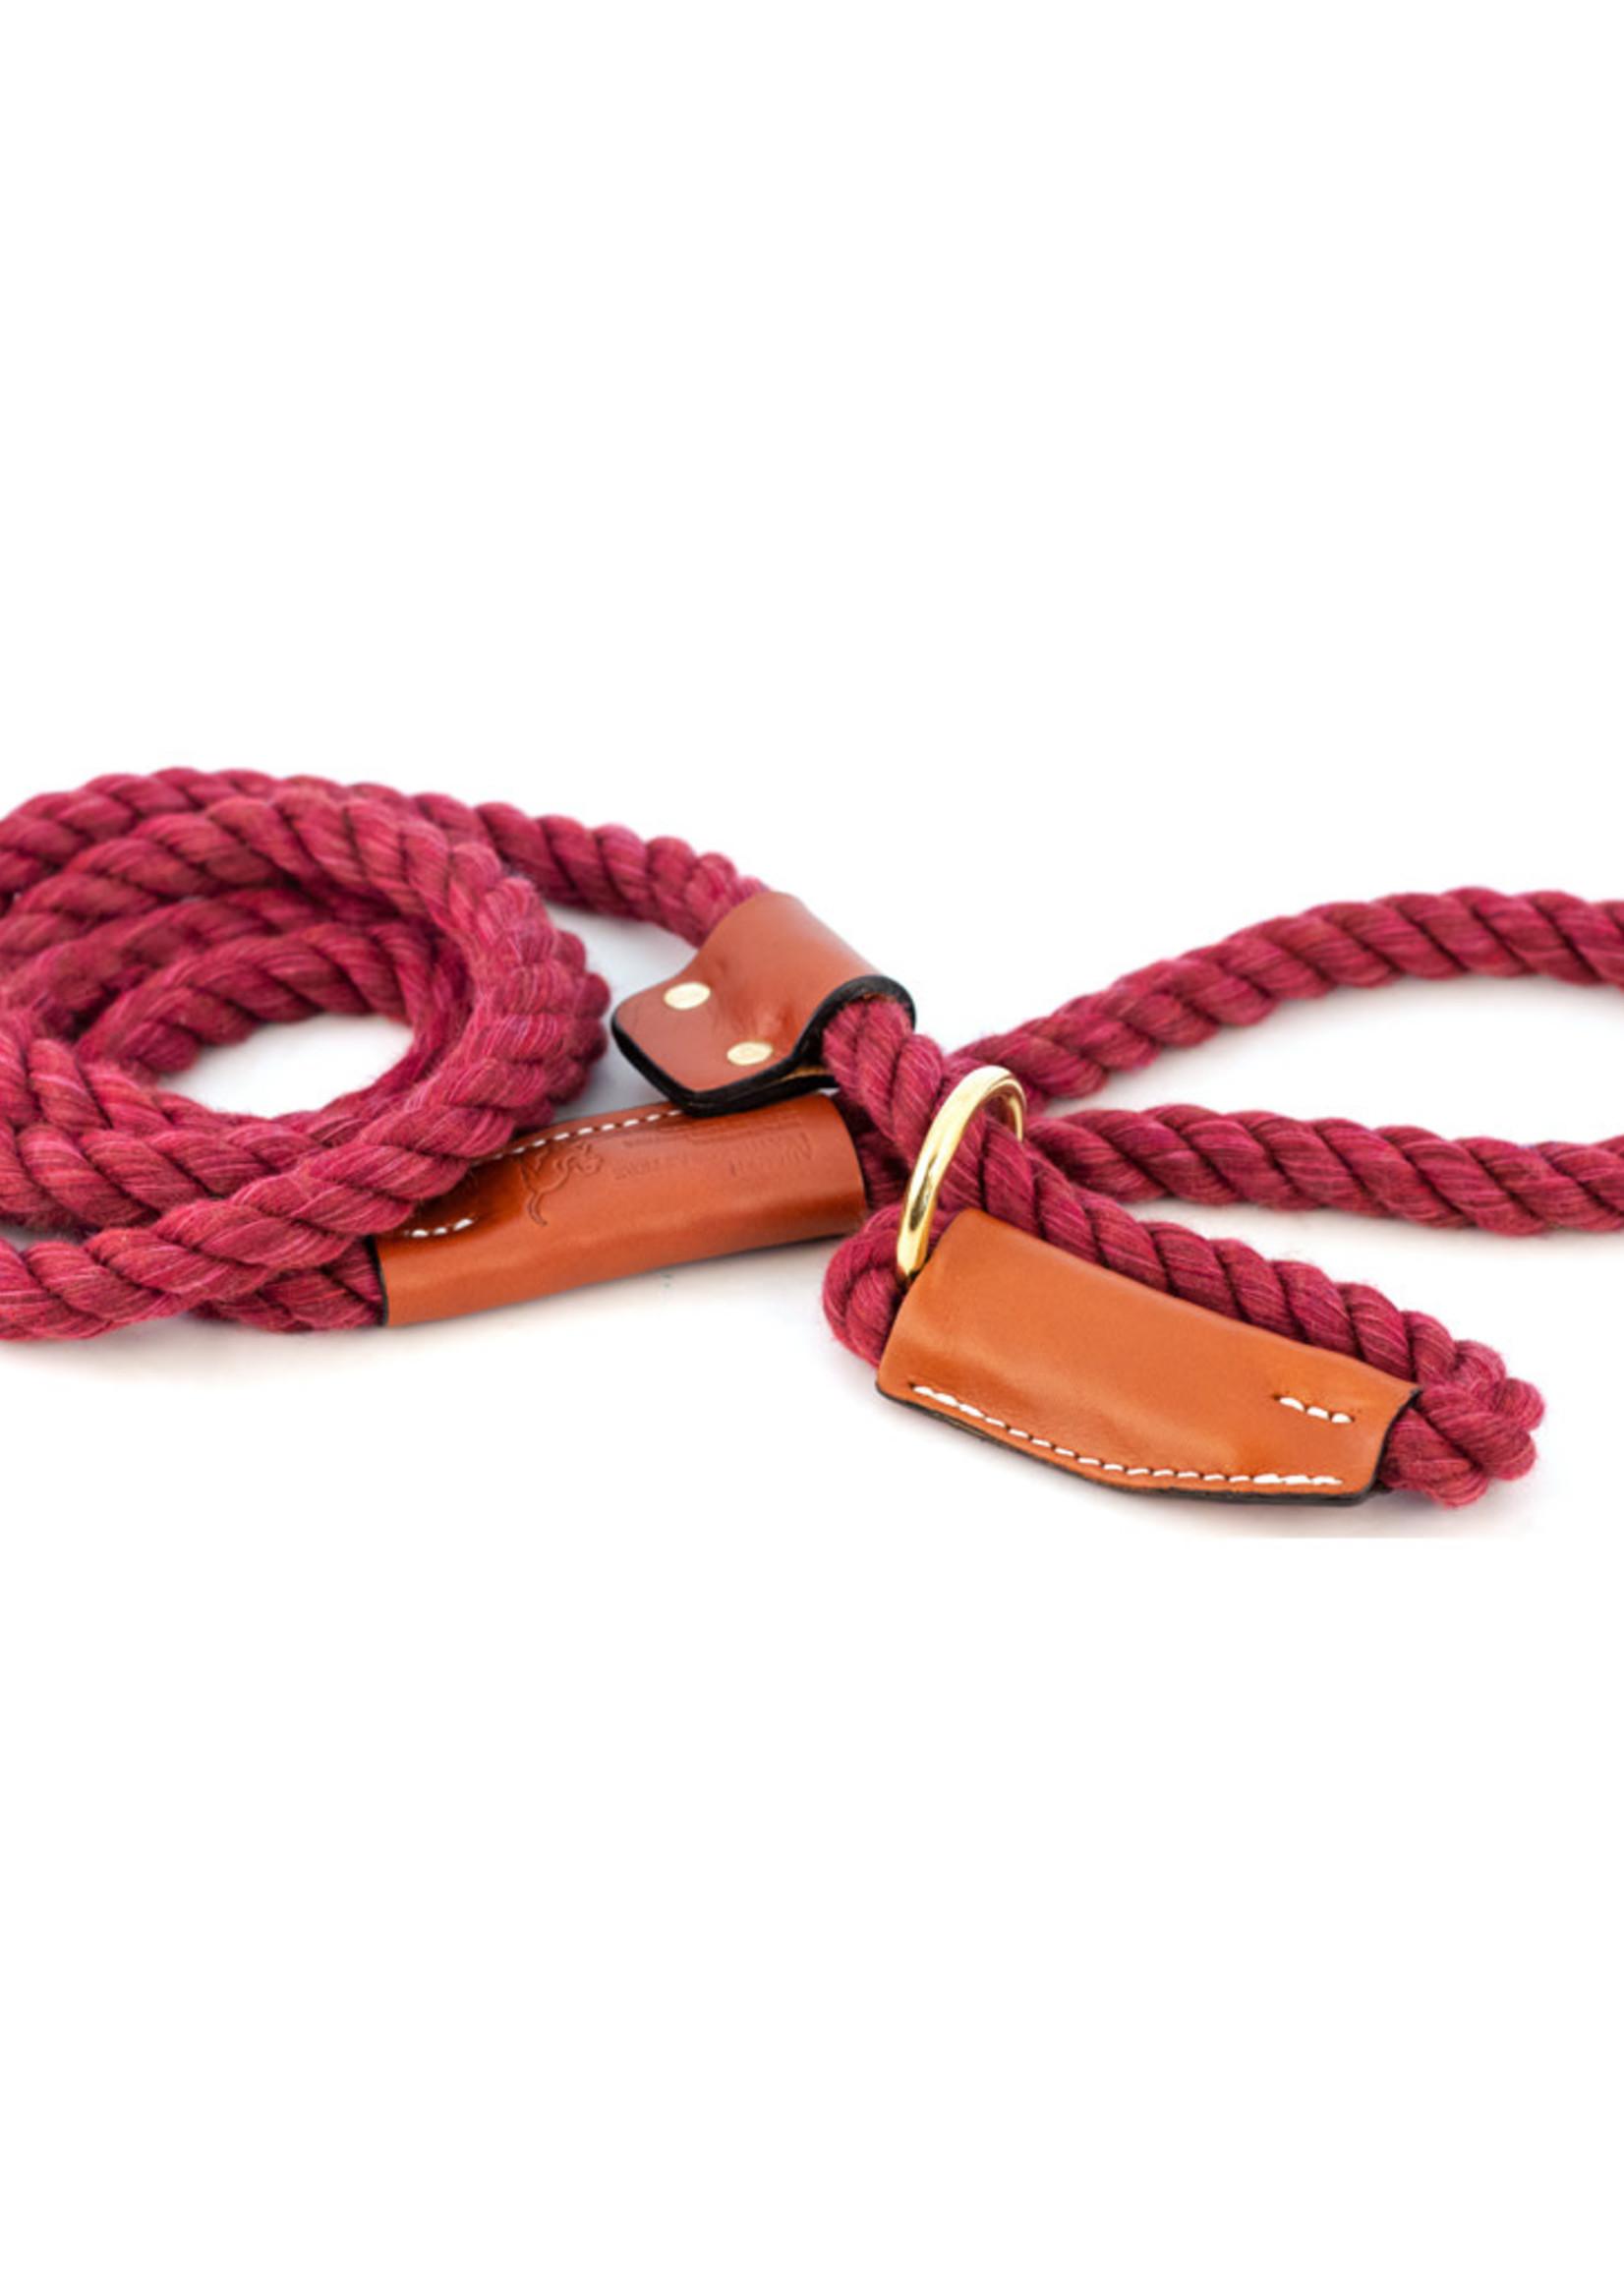 "Auburn Leathercrafters Auburn Leather Rope Leash Snap 1/2"" Maroon"